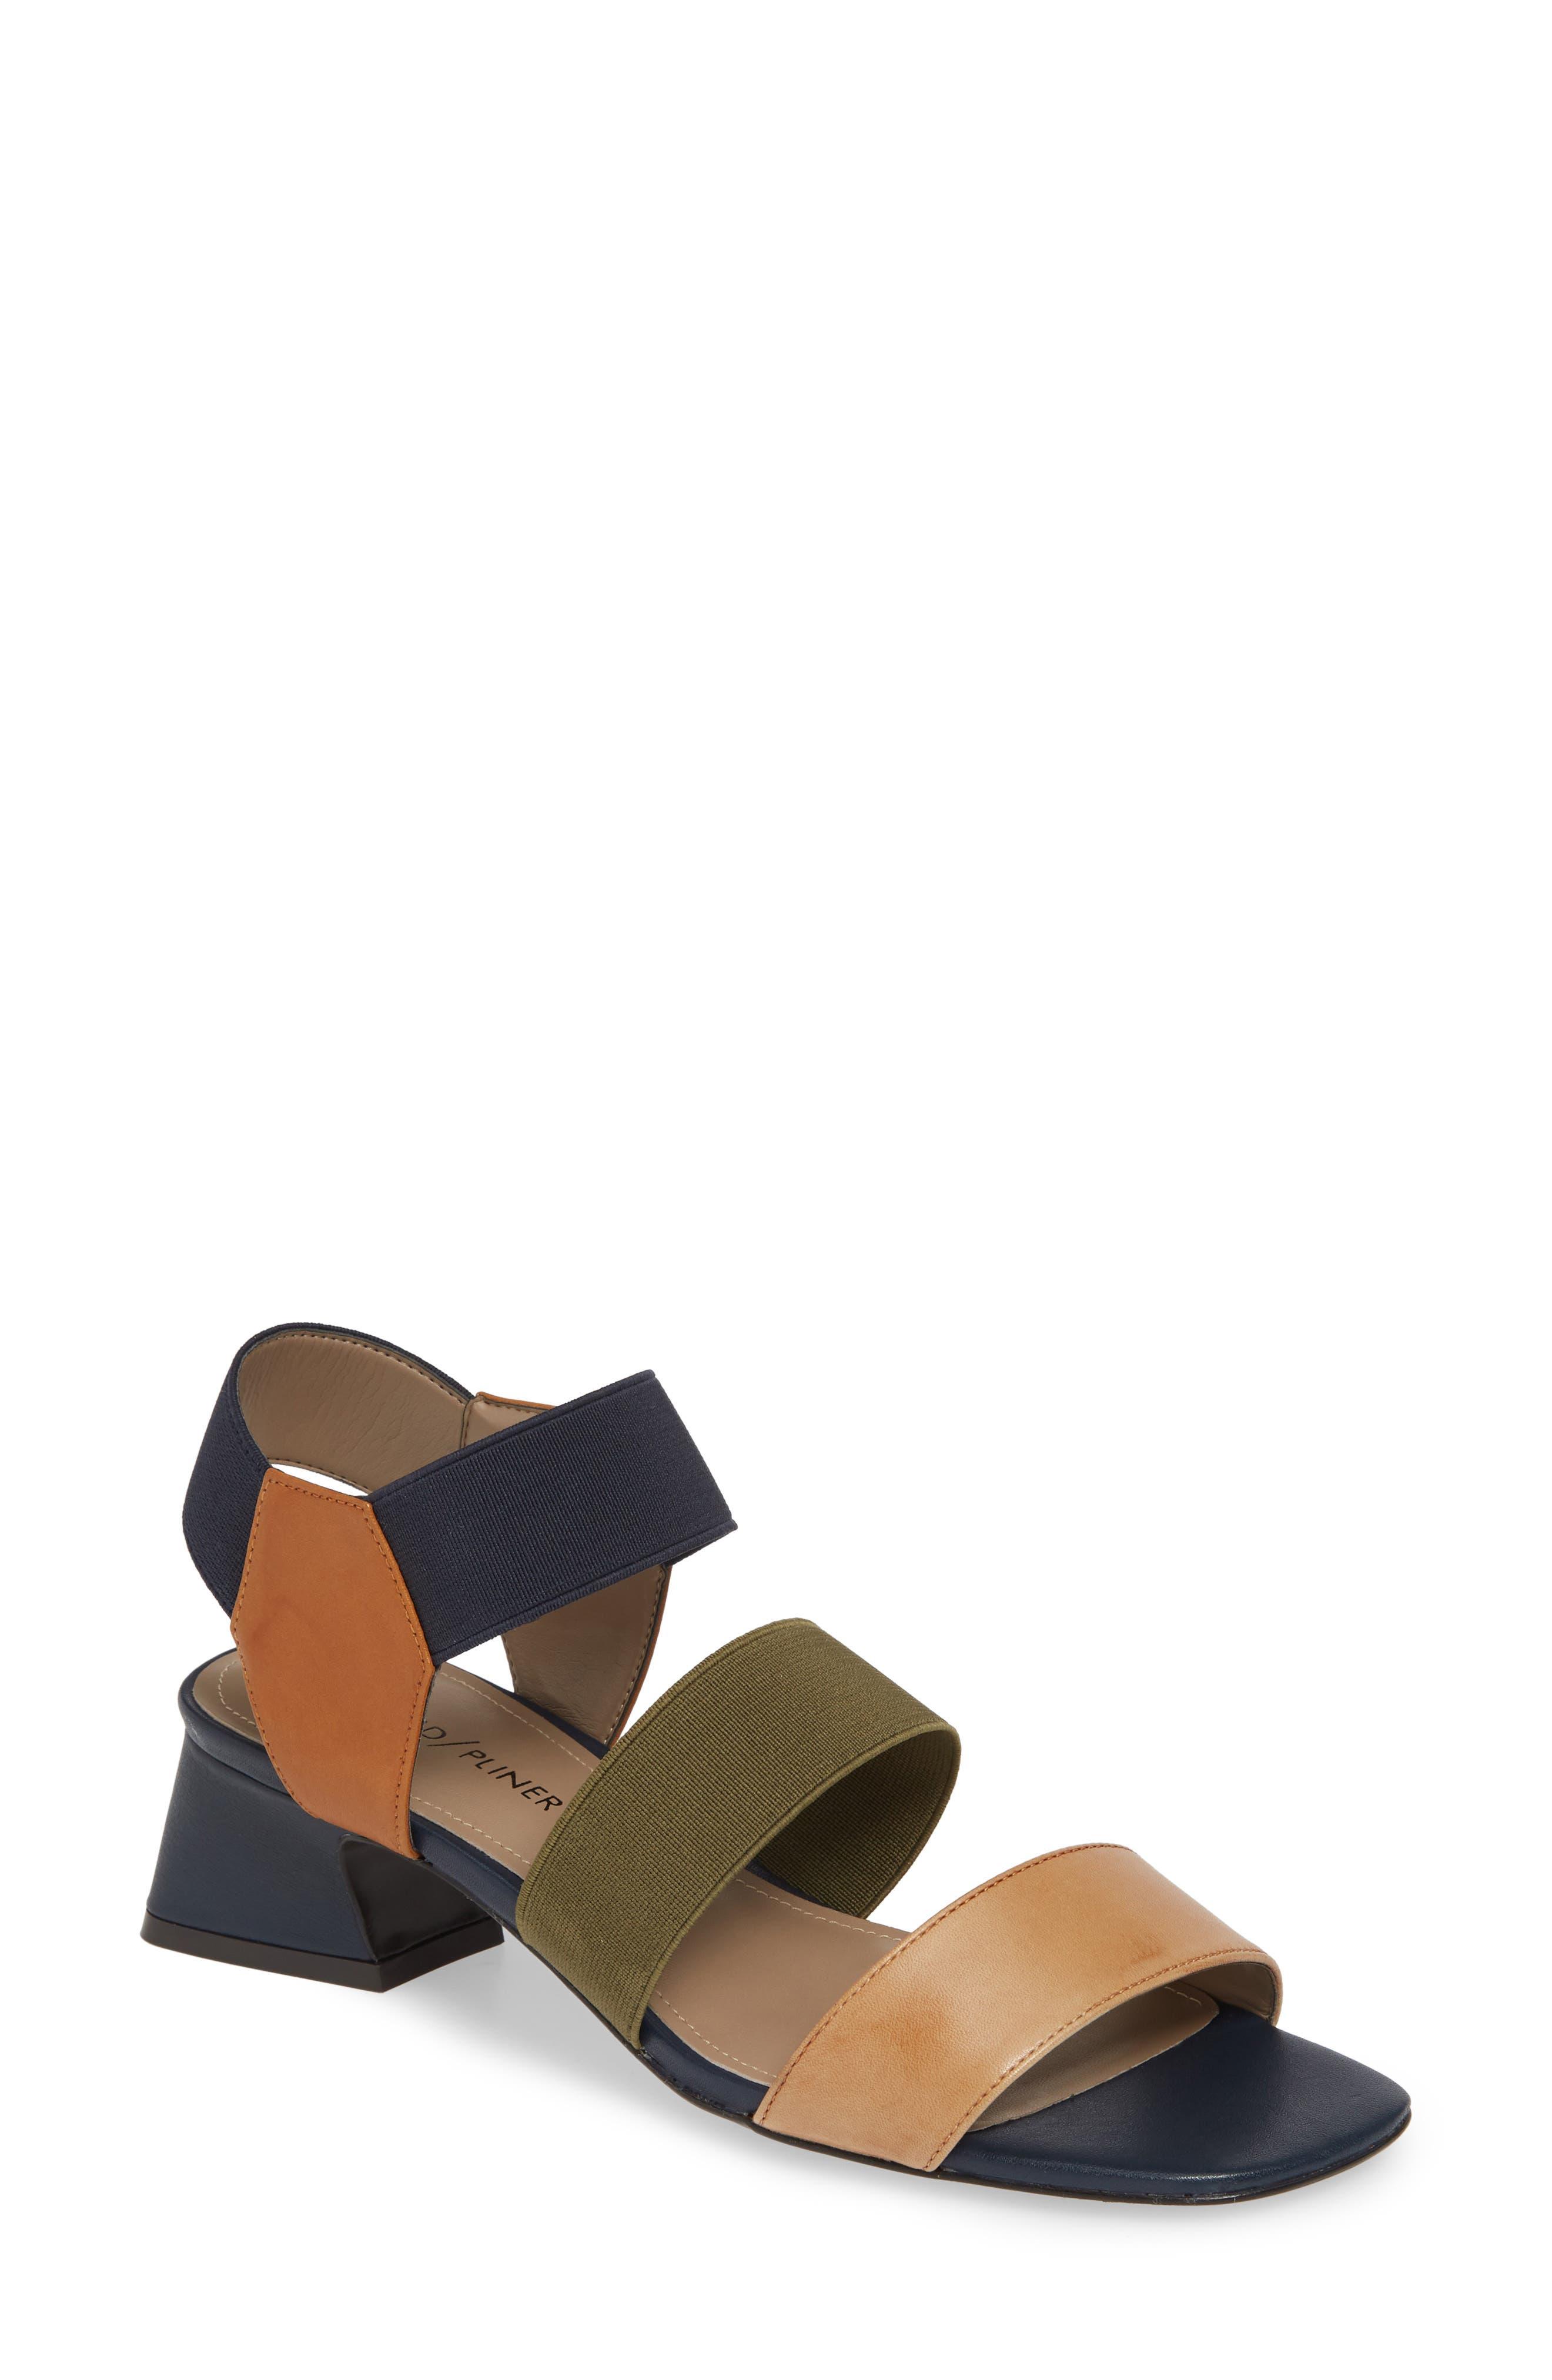 Donald Pliner Sandals BRITINI SANDAL